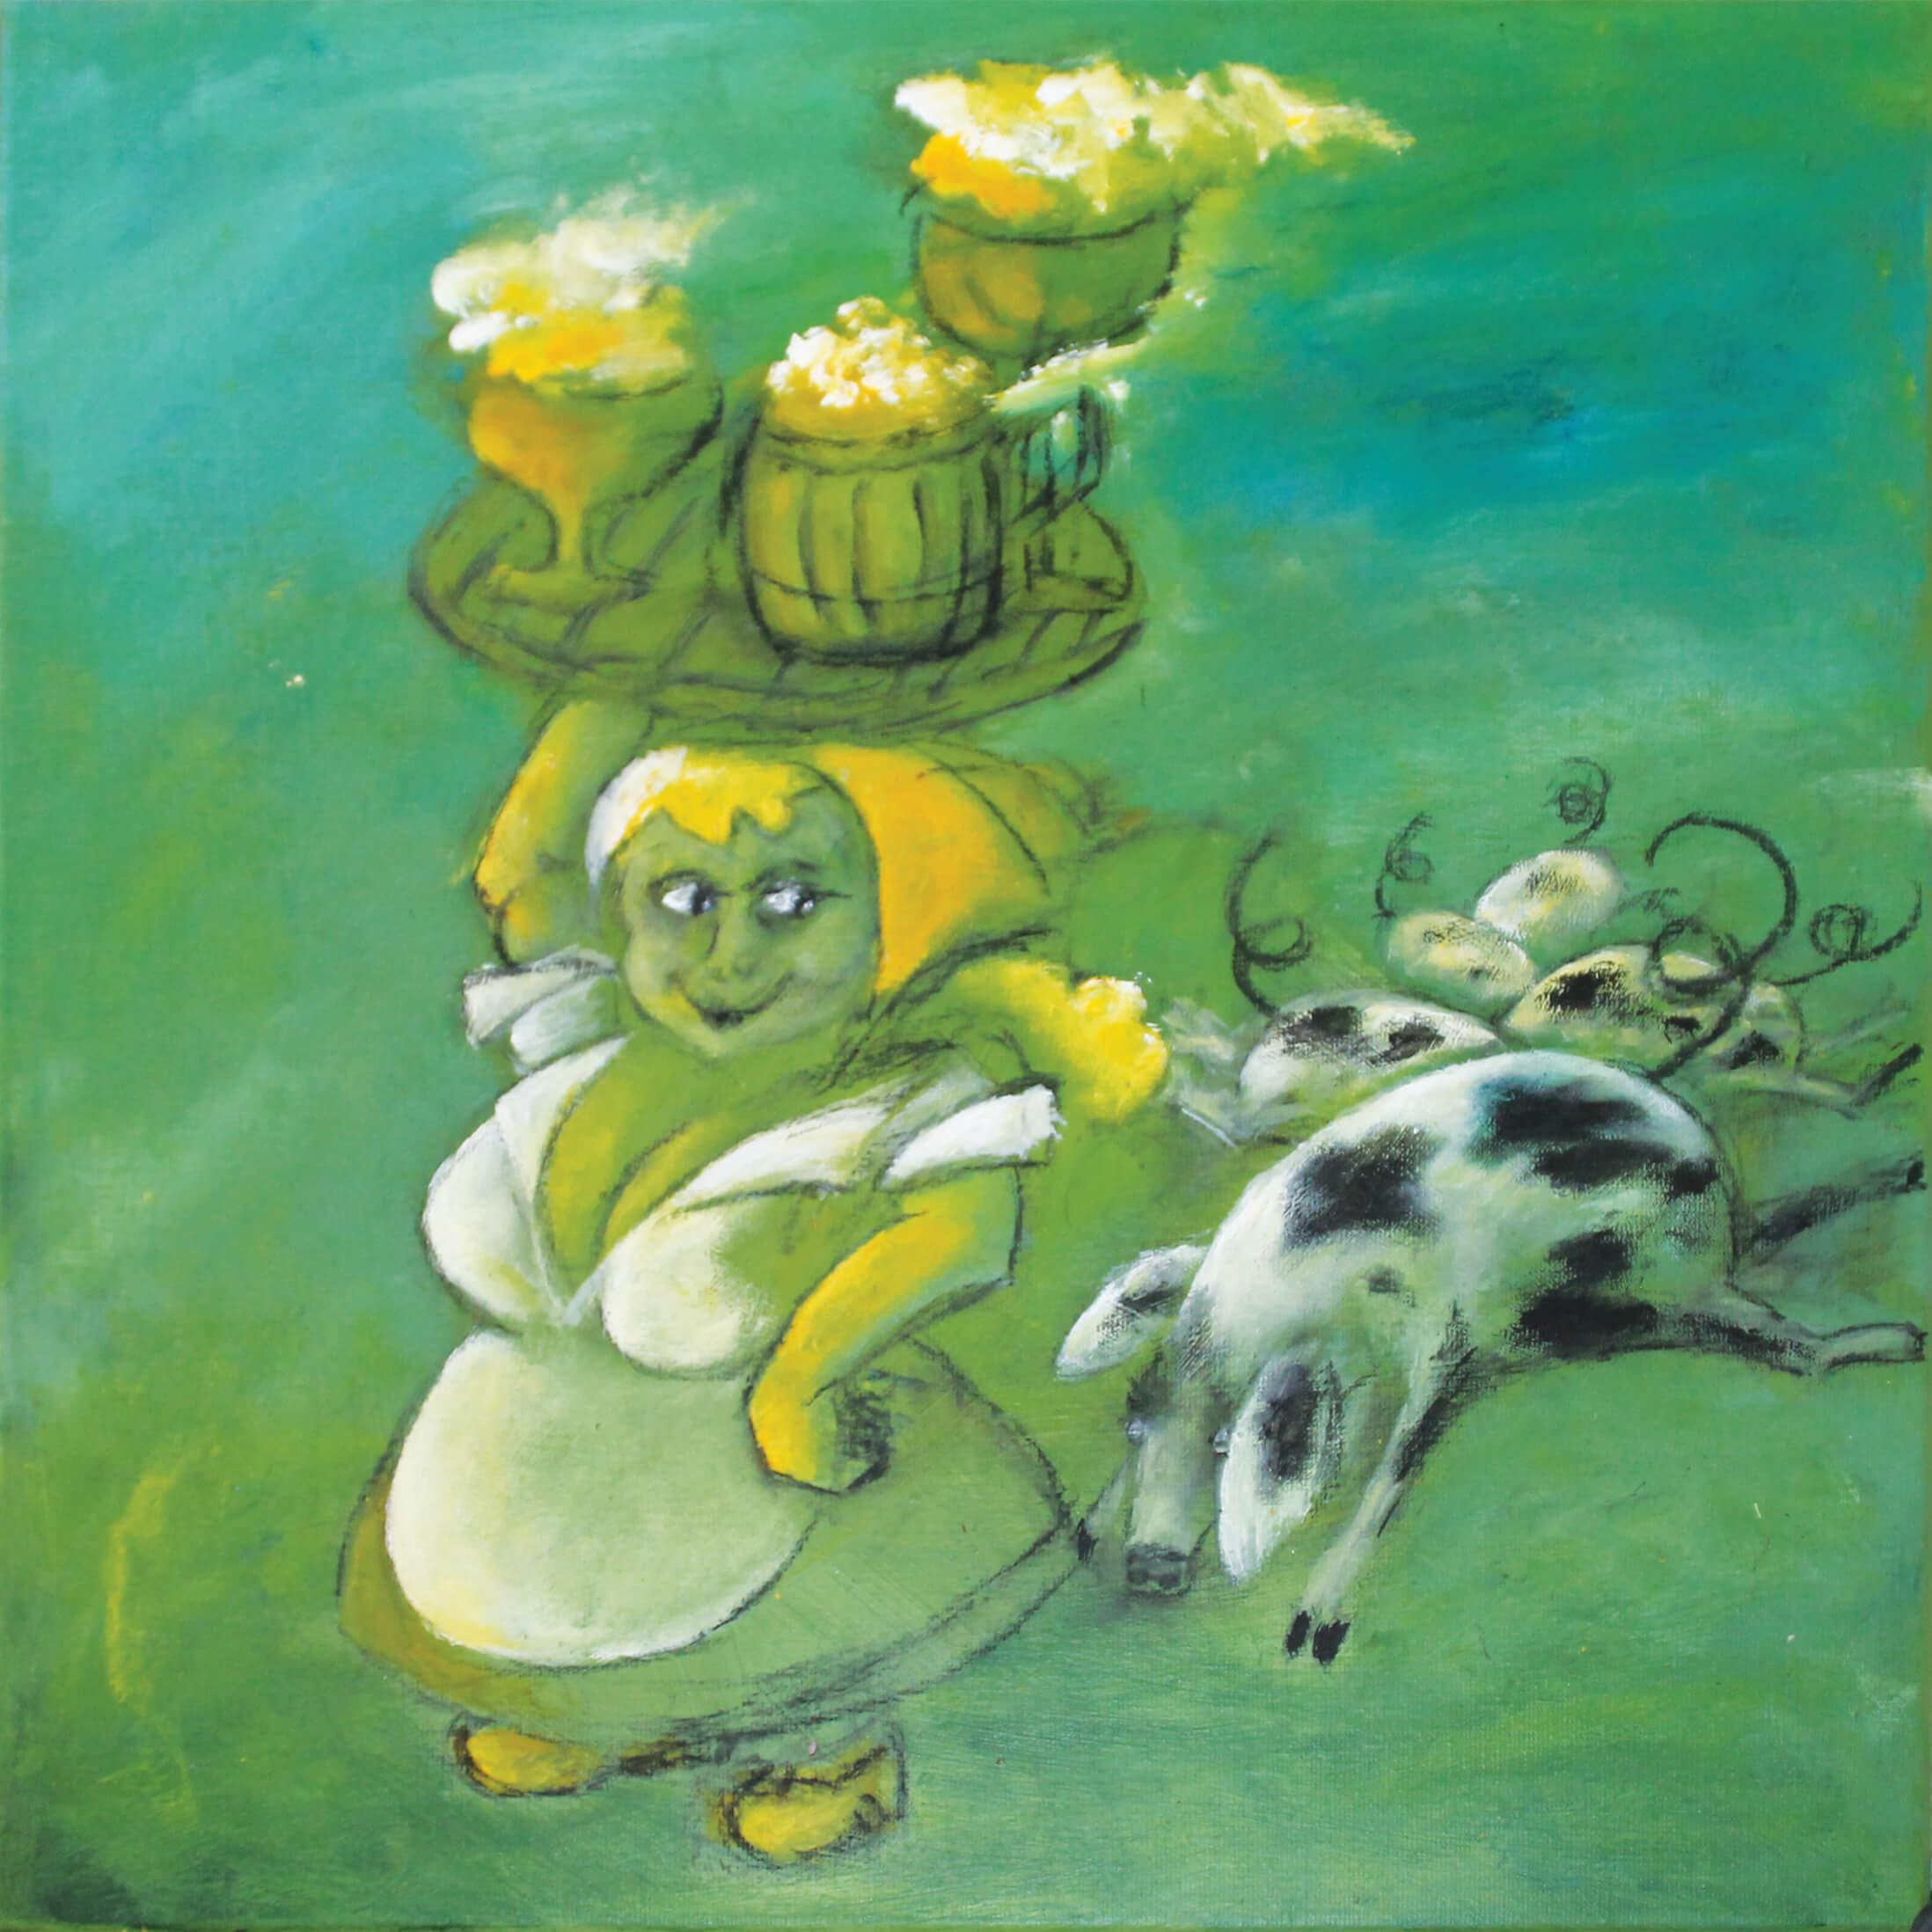 maleri Bondepige af Gunhild Rasmussen